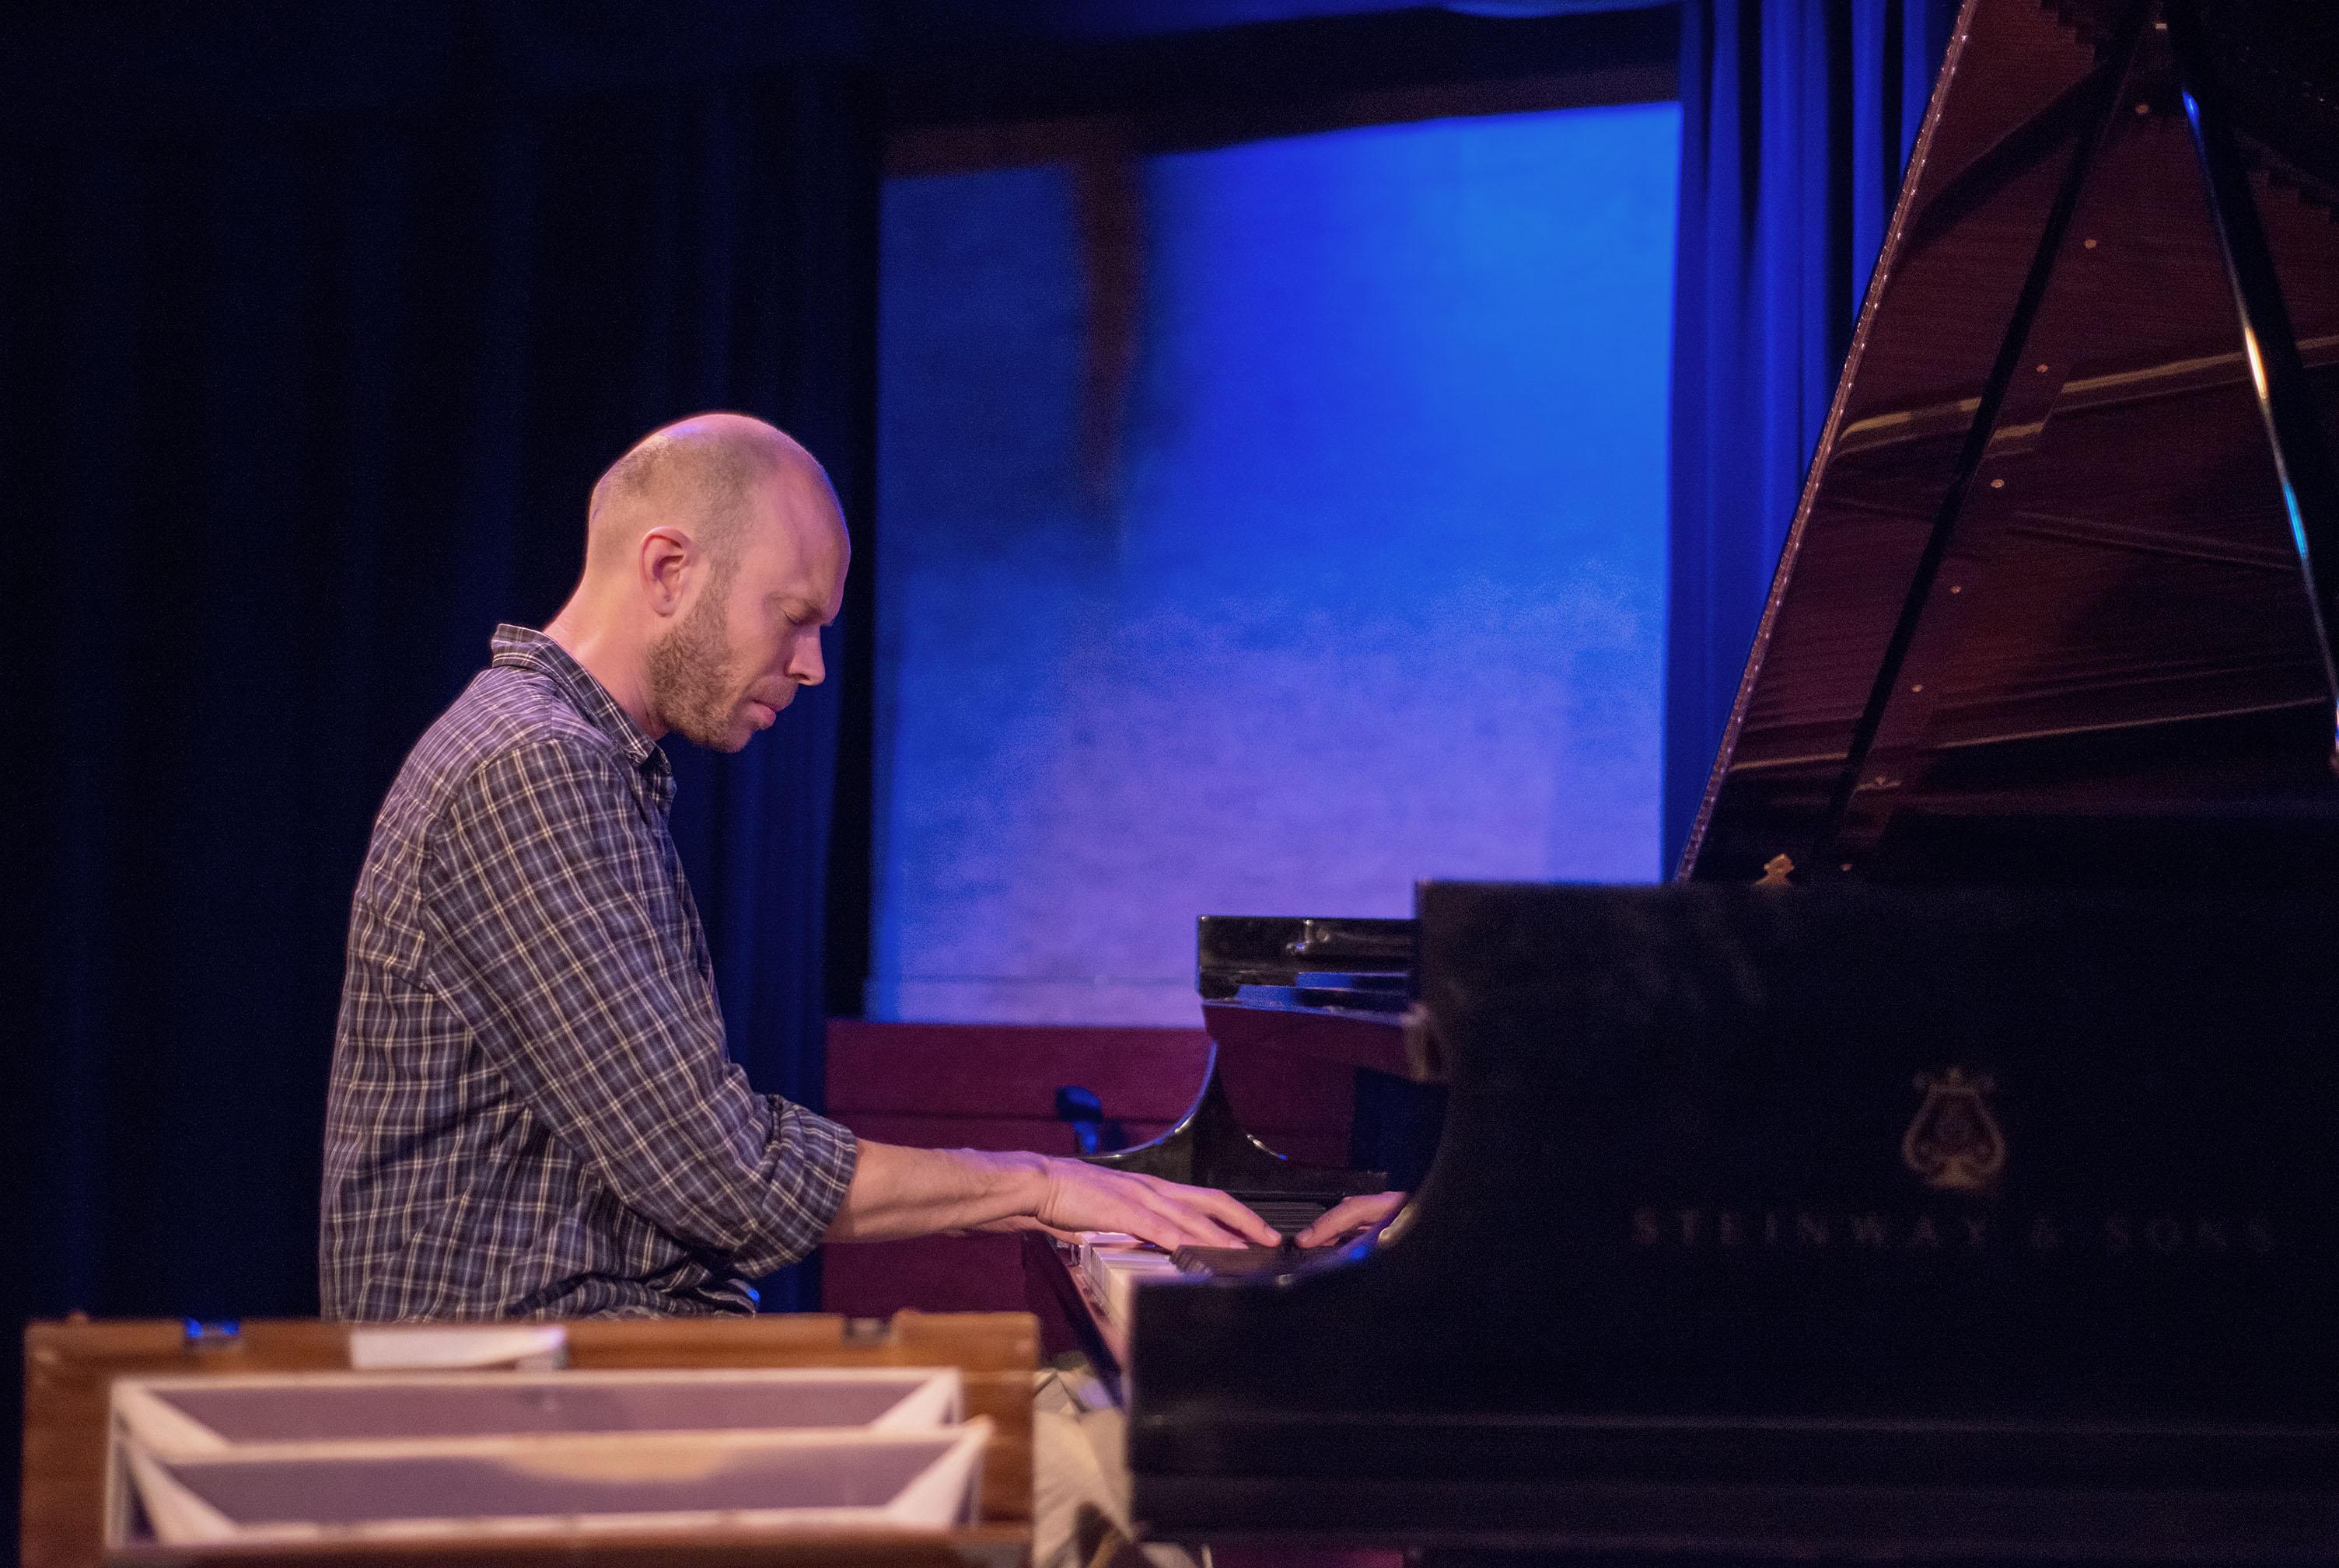 Christian wallumrød ensemble, 2013 td ottawa jazz festival